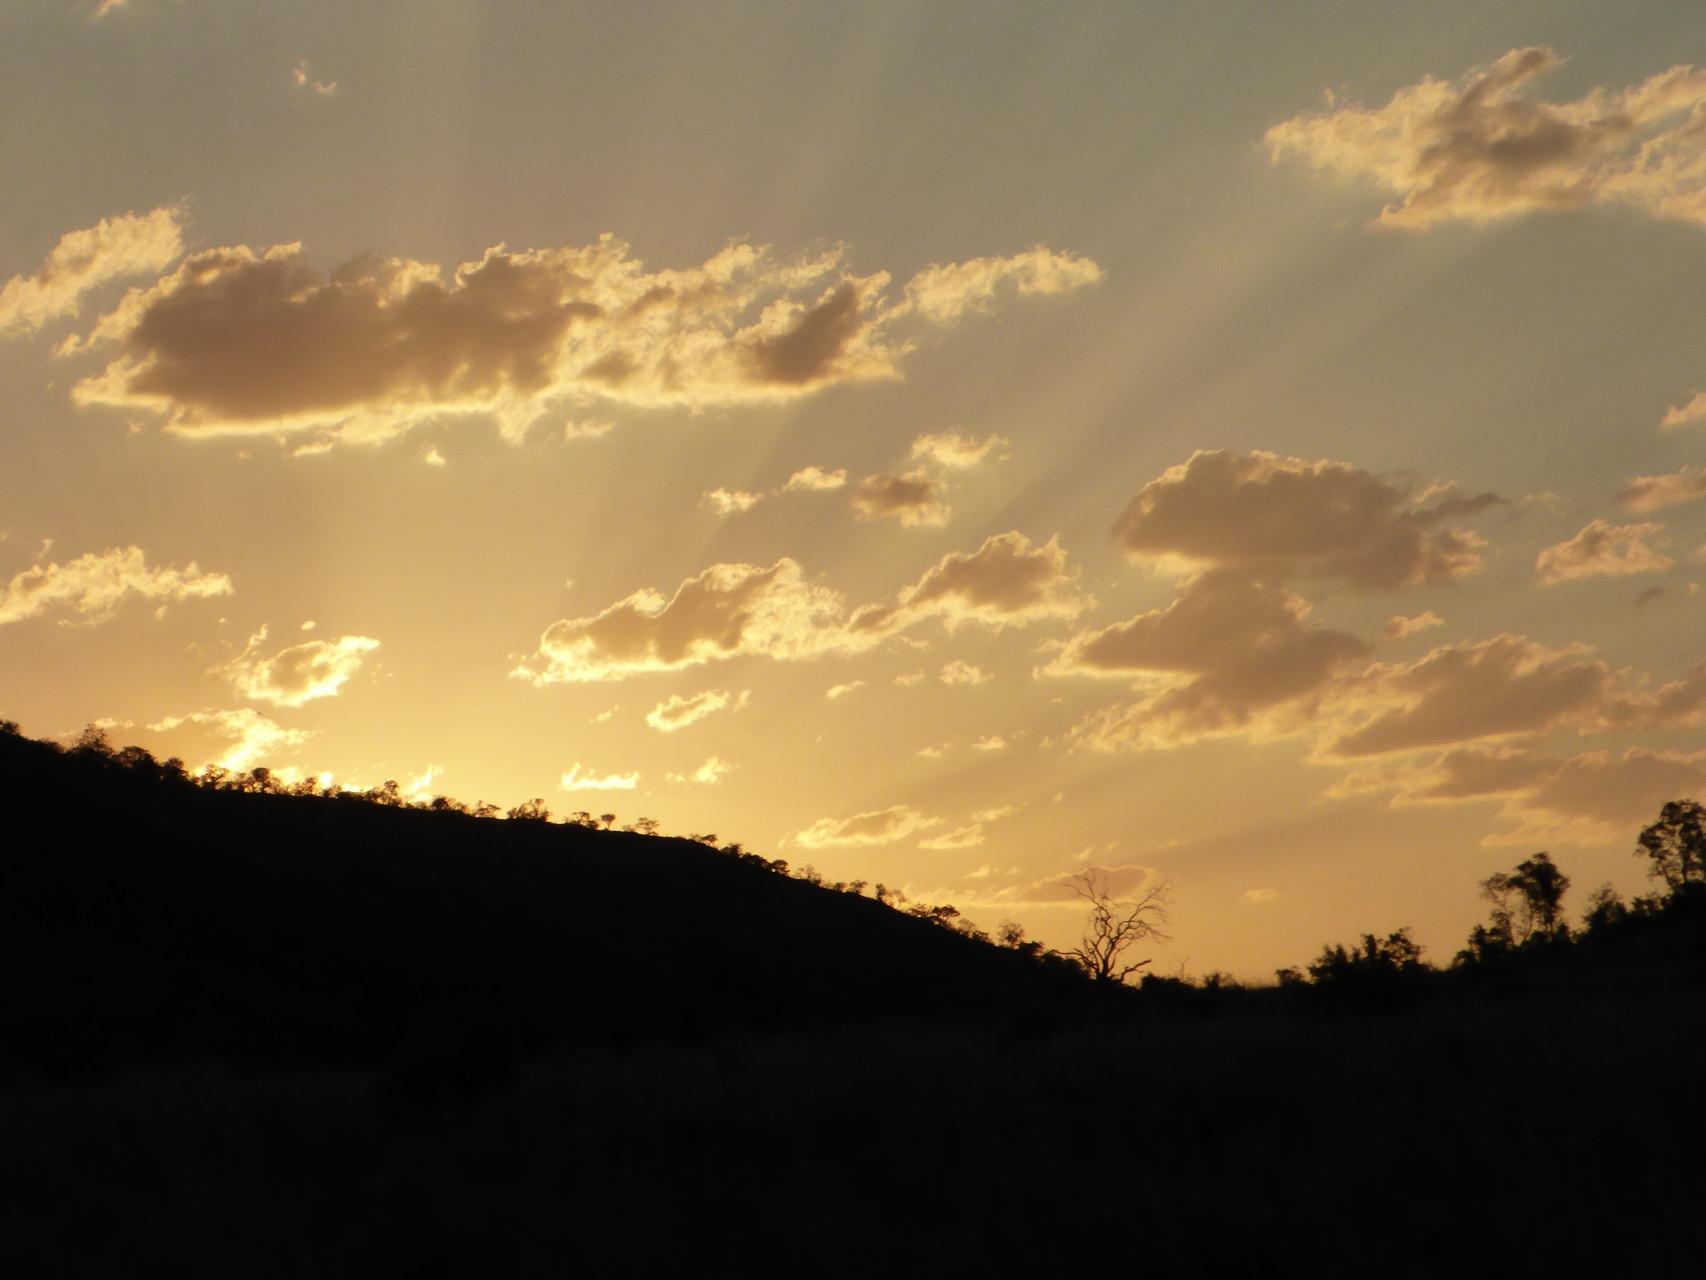 What a beautiful sundown *-*